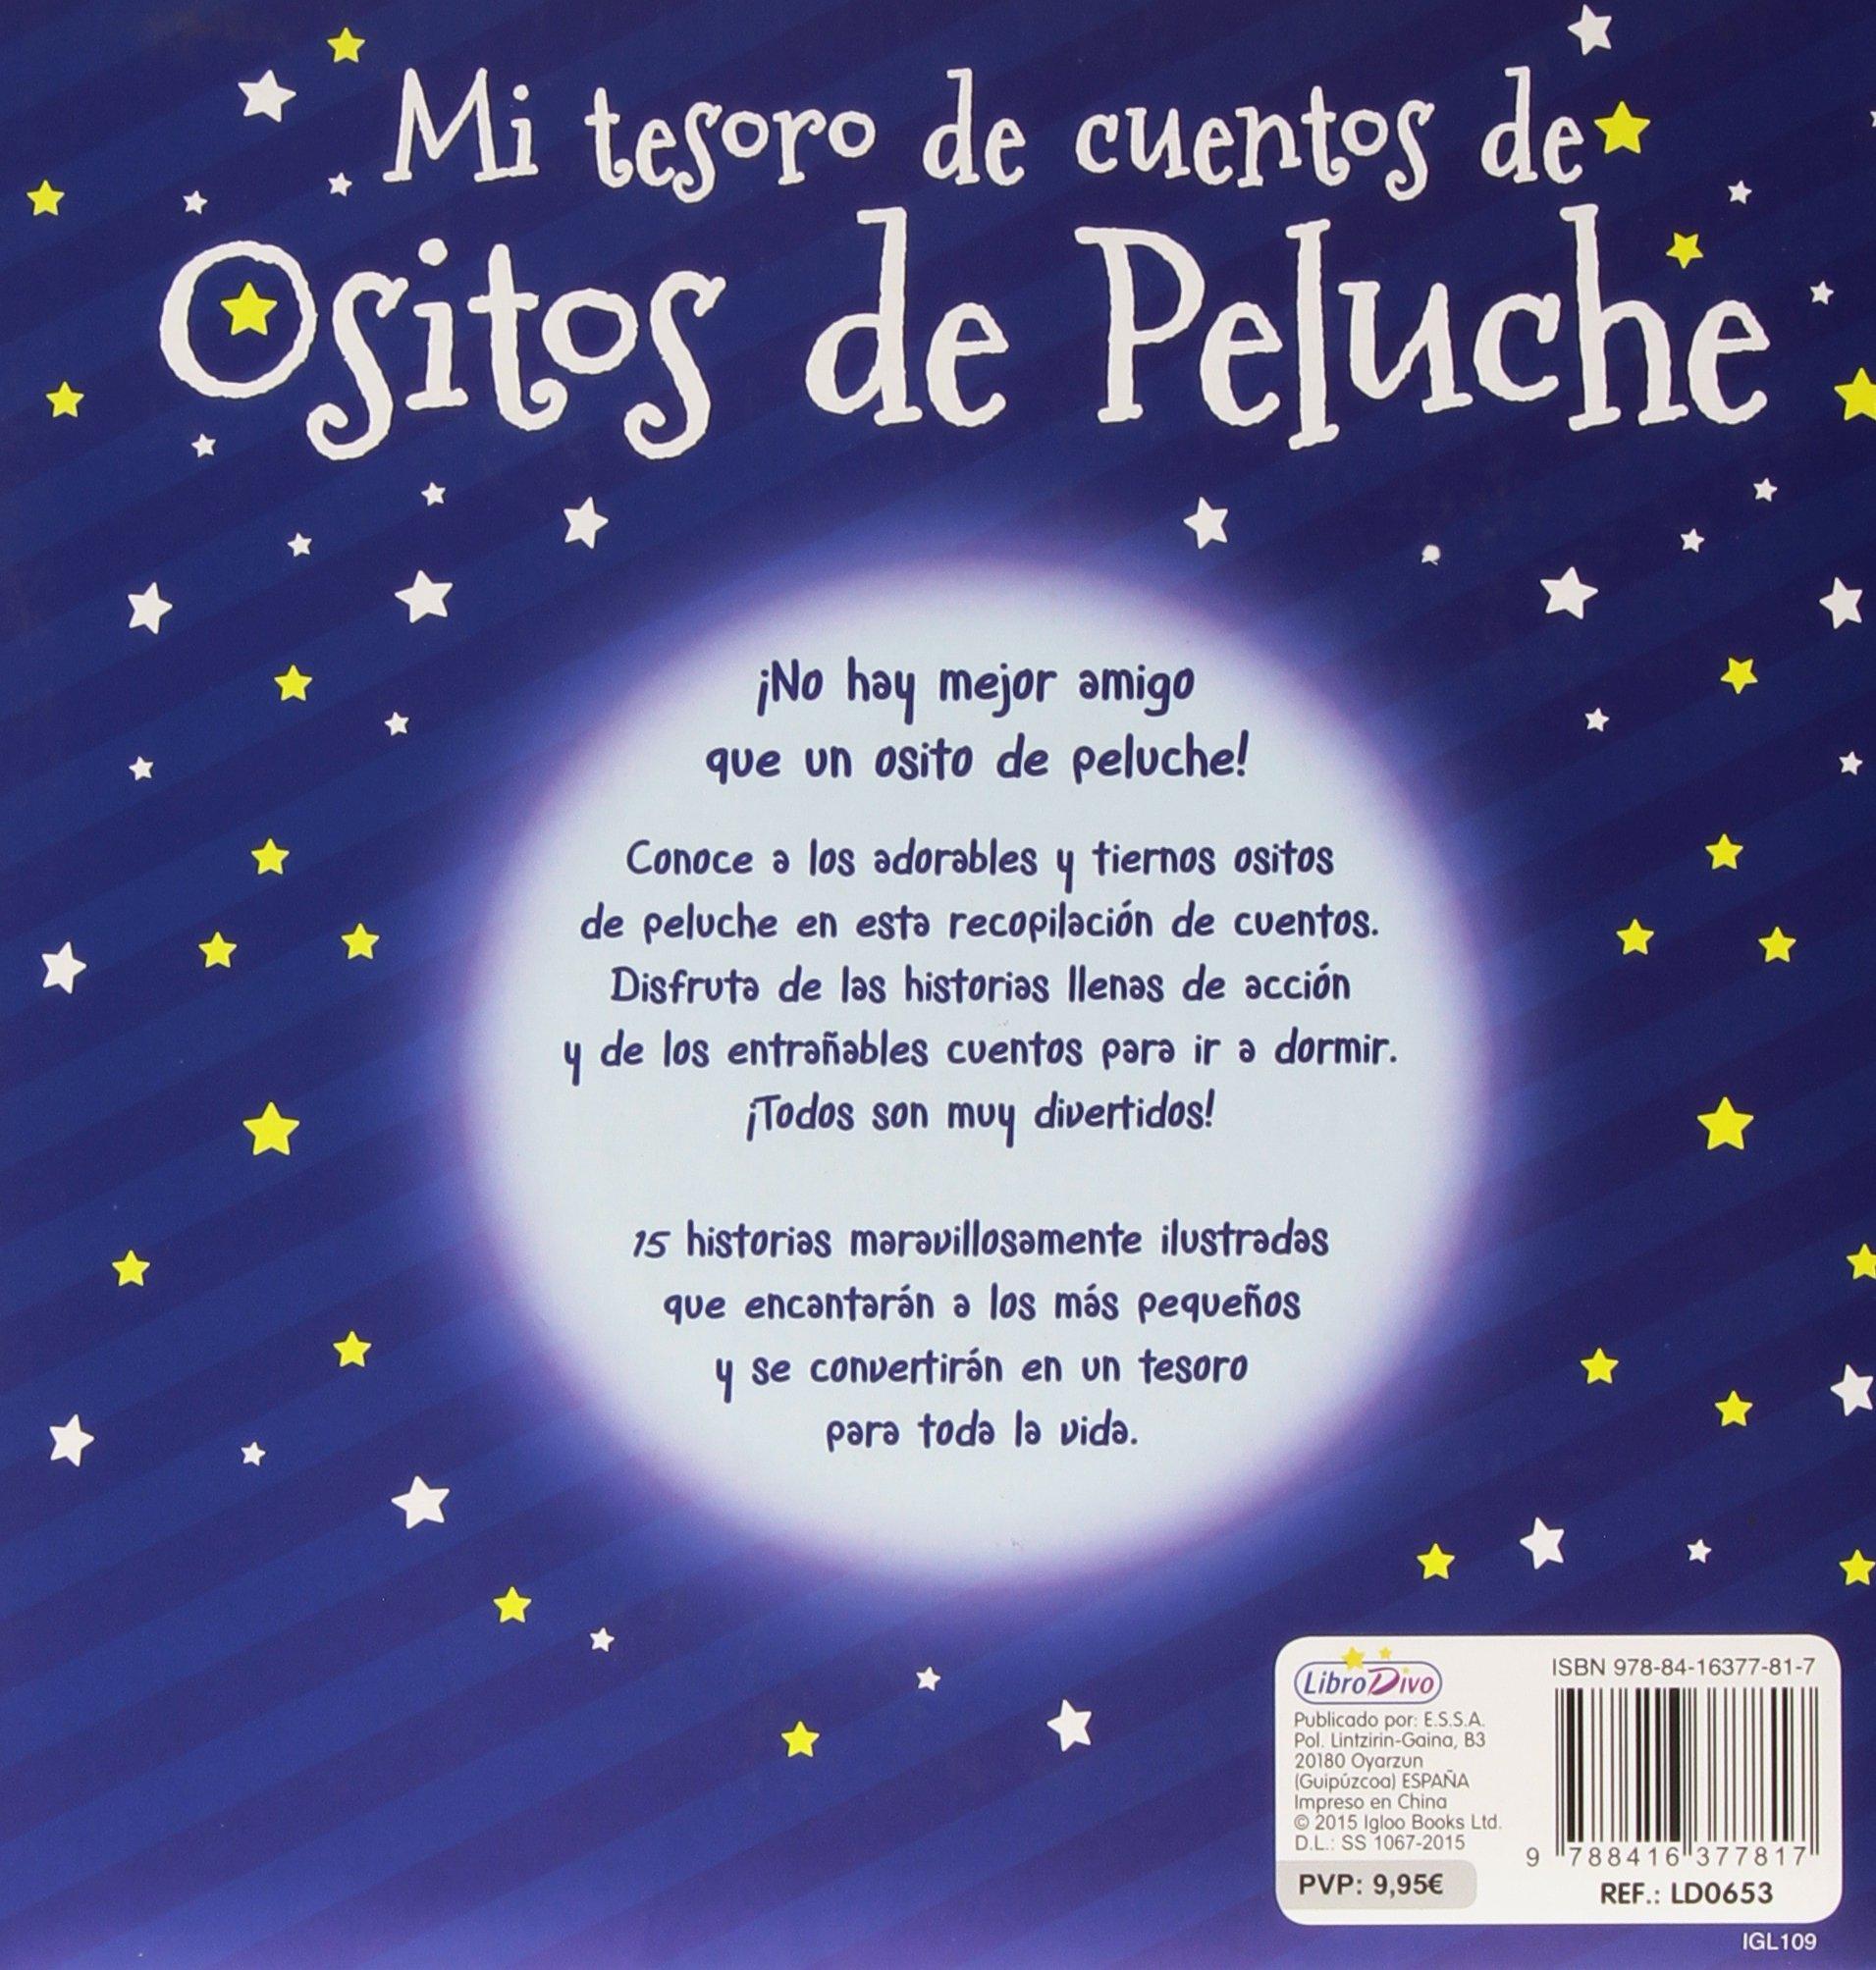 Mi Tesoro De Cuentos De Ositos De Peluche: VV.AA.: 9788416377817: Amazon.com: Books